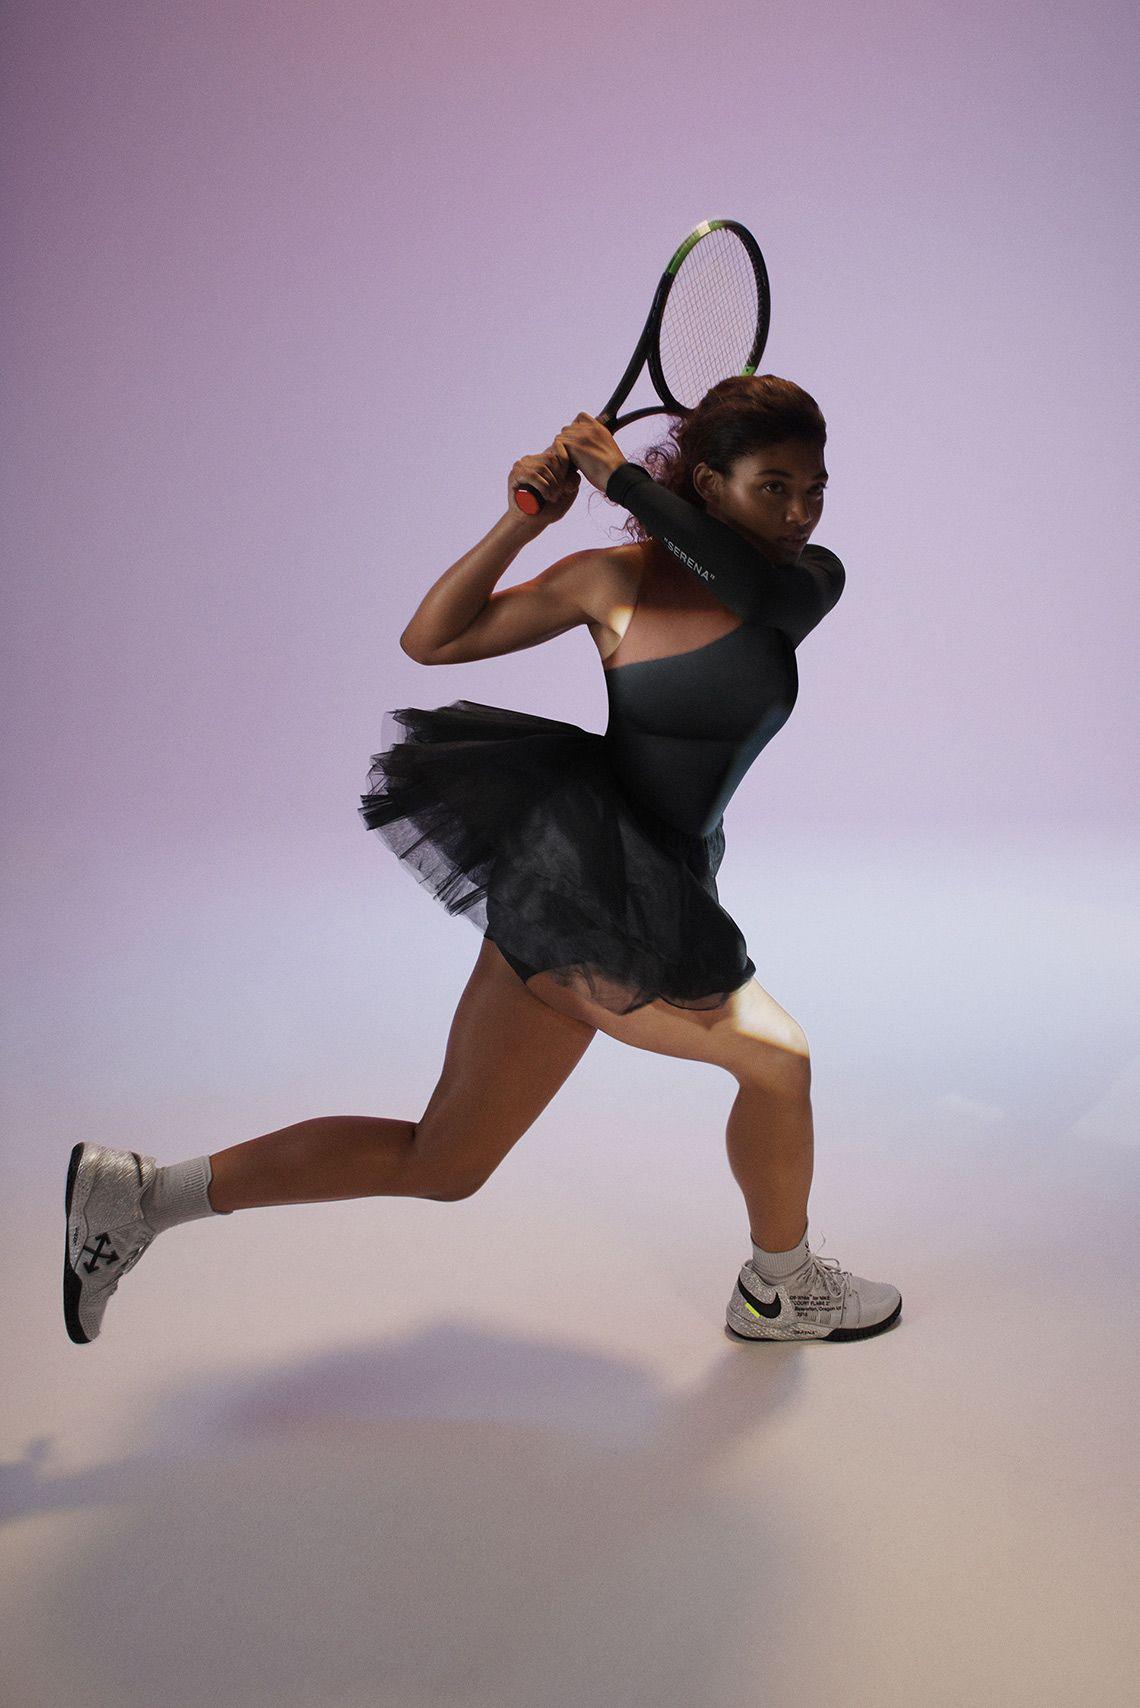 bdce0b3e66 Off-White Virgil Abloh Serena Williams Nike Air Max 97 + Blazer |  SneakerNews.com